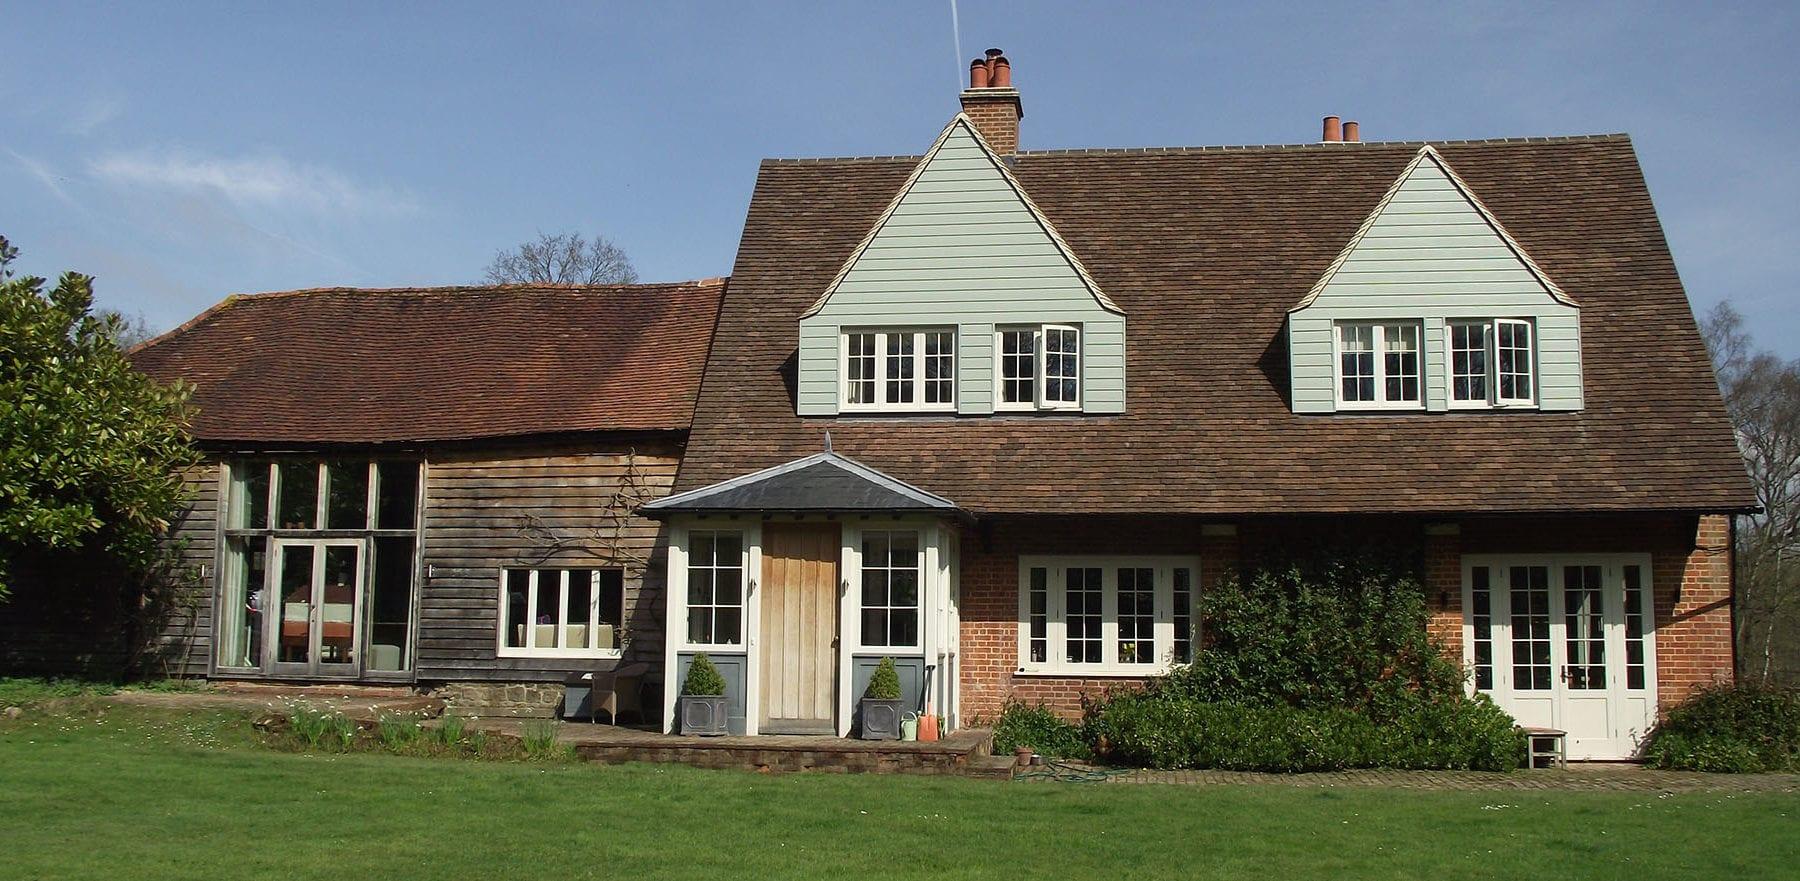 Lifestiles - Handmade Restoration Clay Roof Tiles - Liphook, England 3